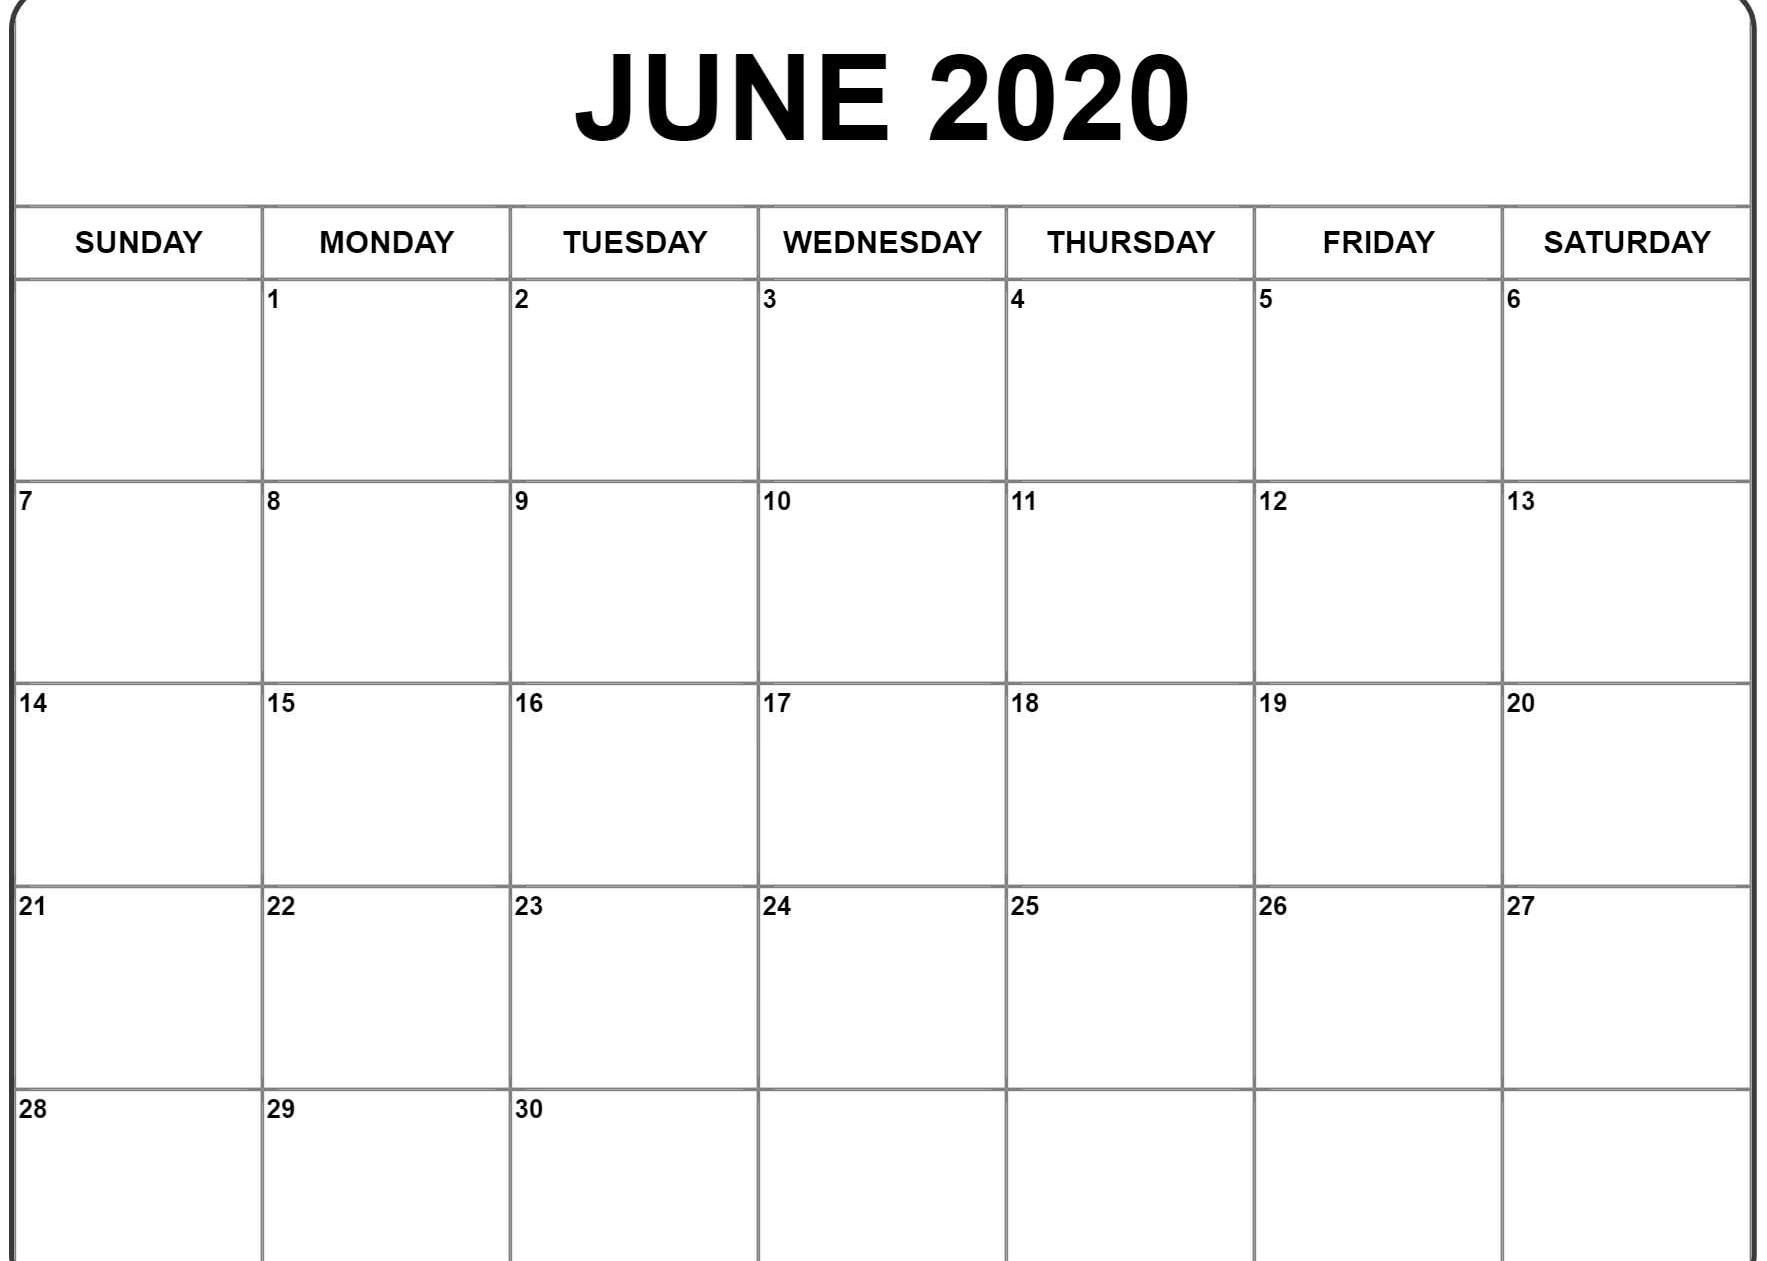 June 2020 Calendar   Printable Calendar Template, Monthly